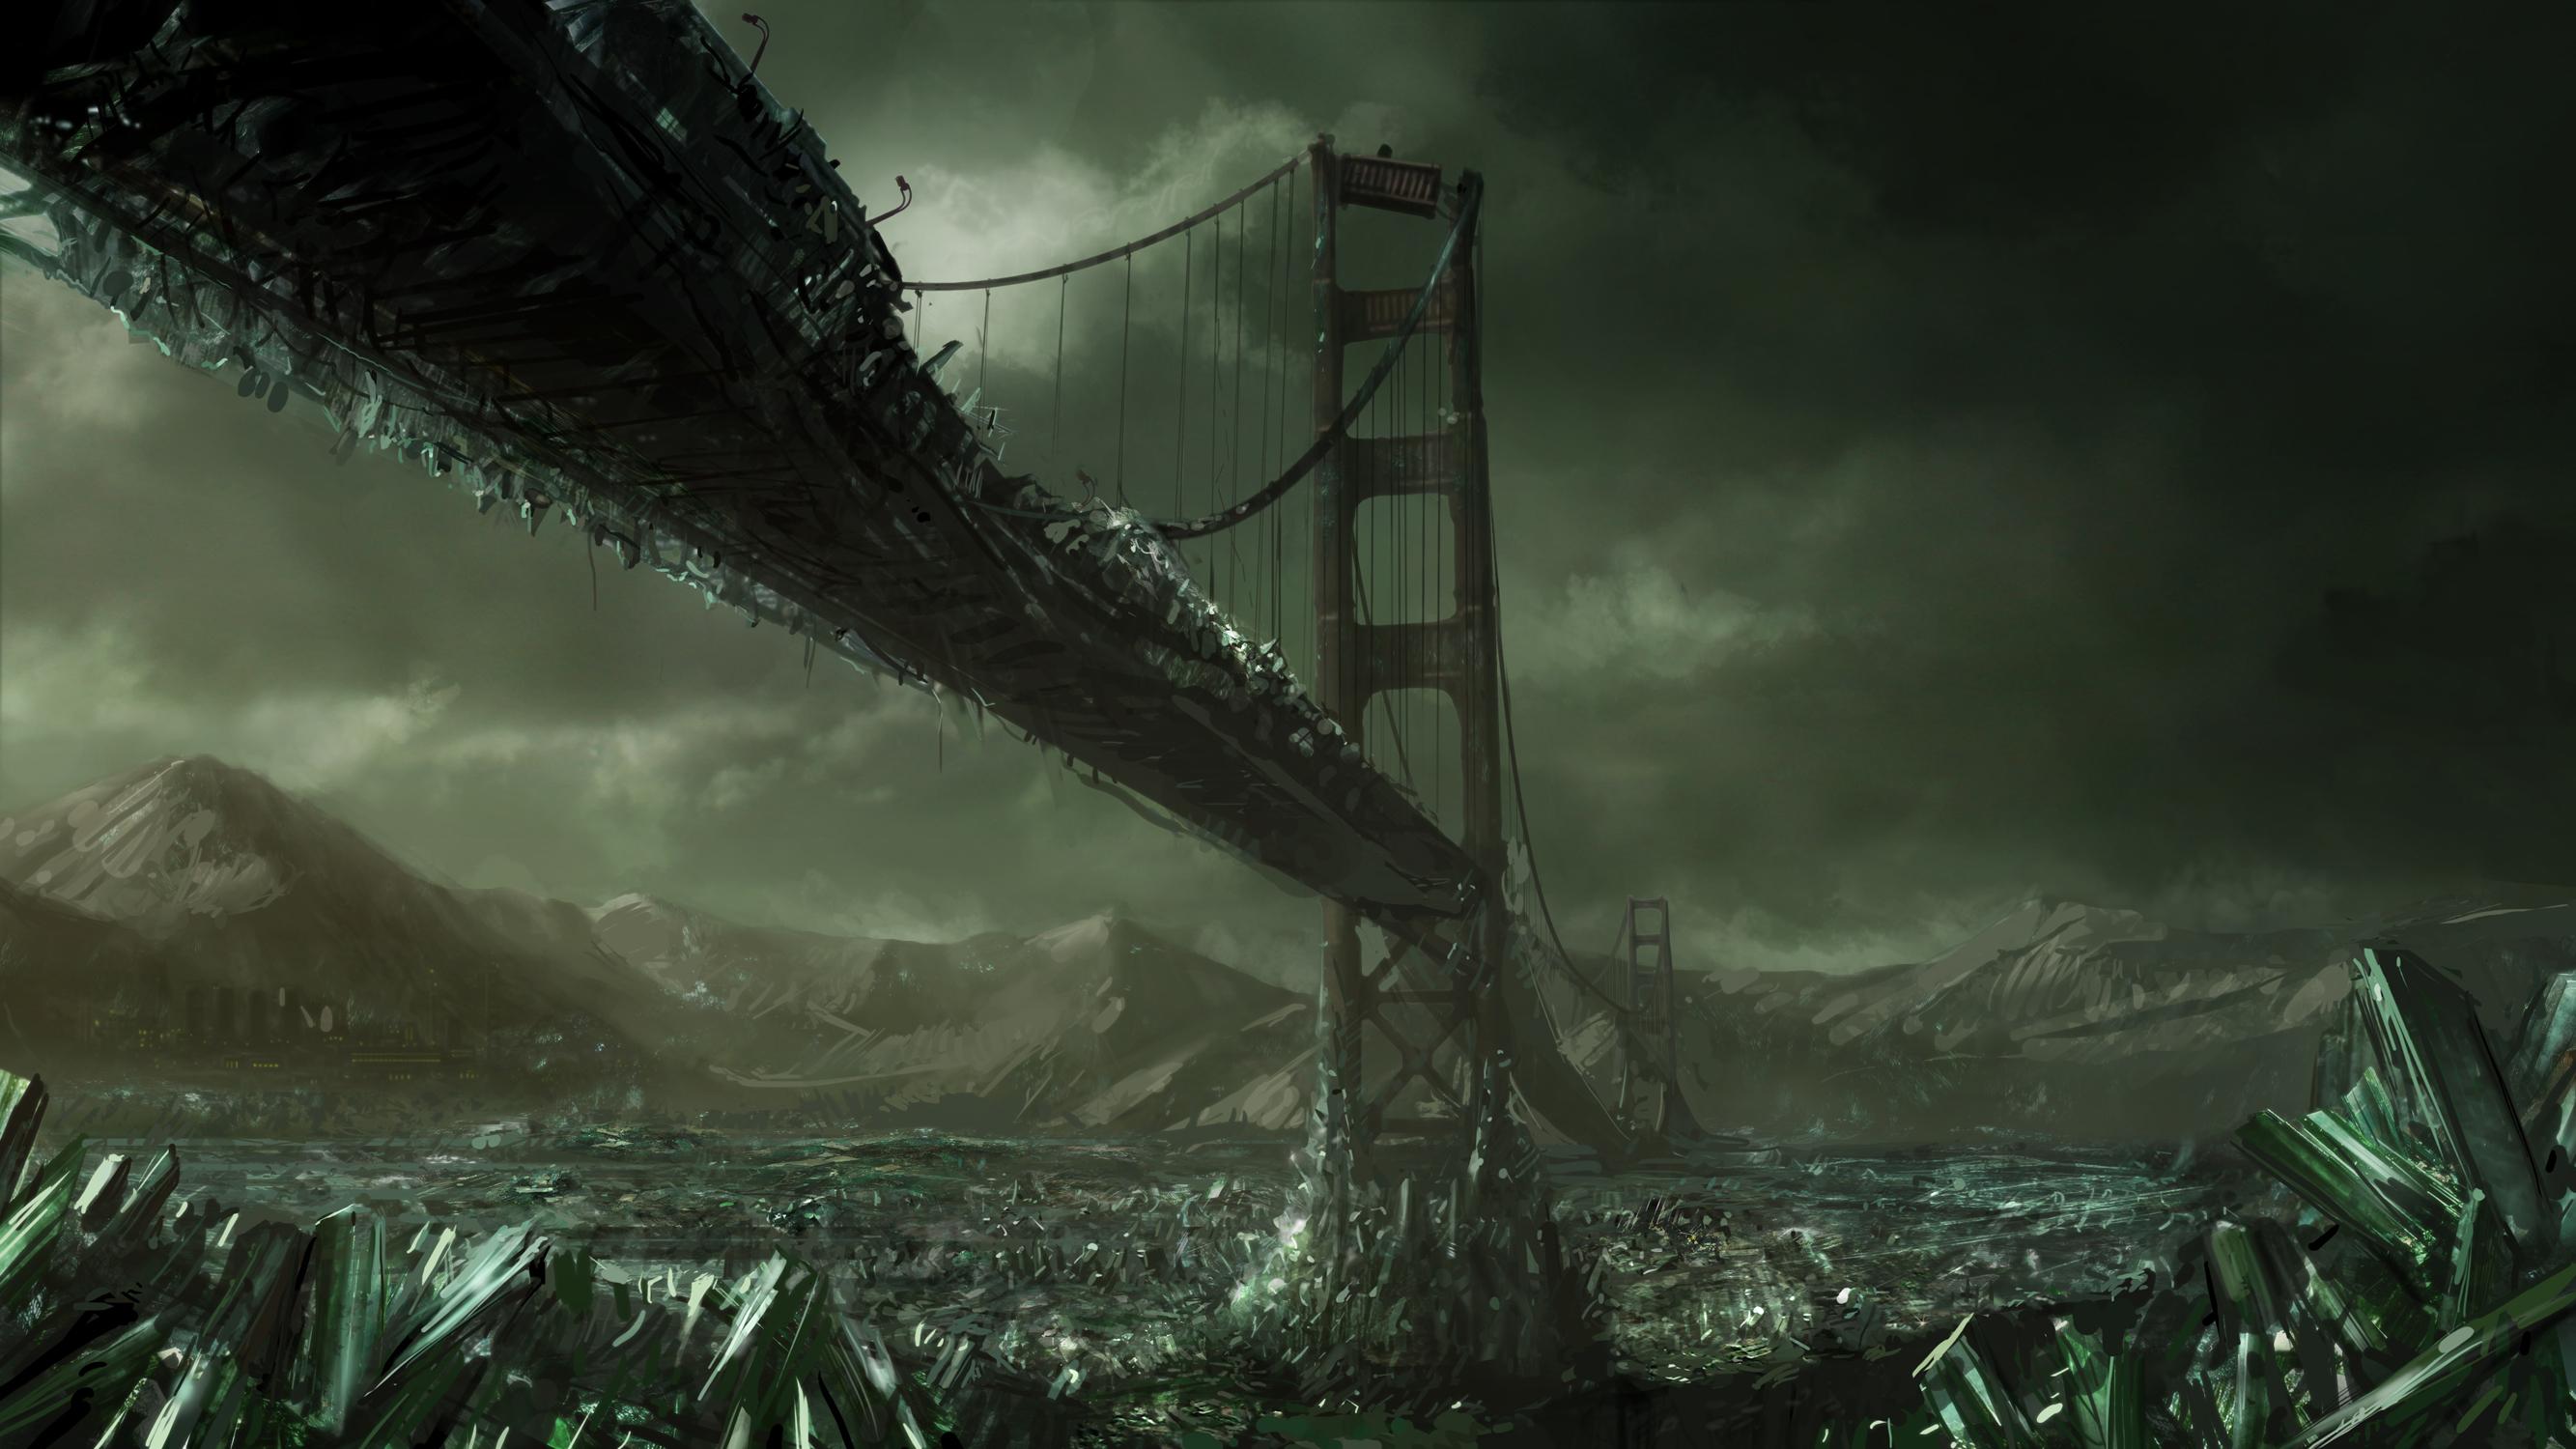 Apocalyptic #19